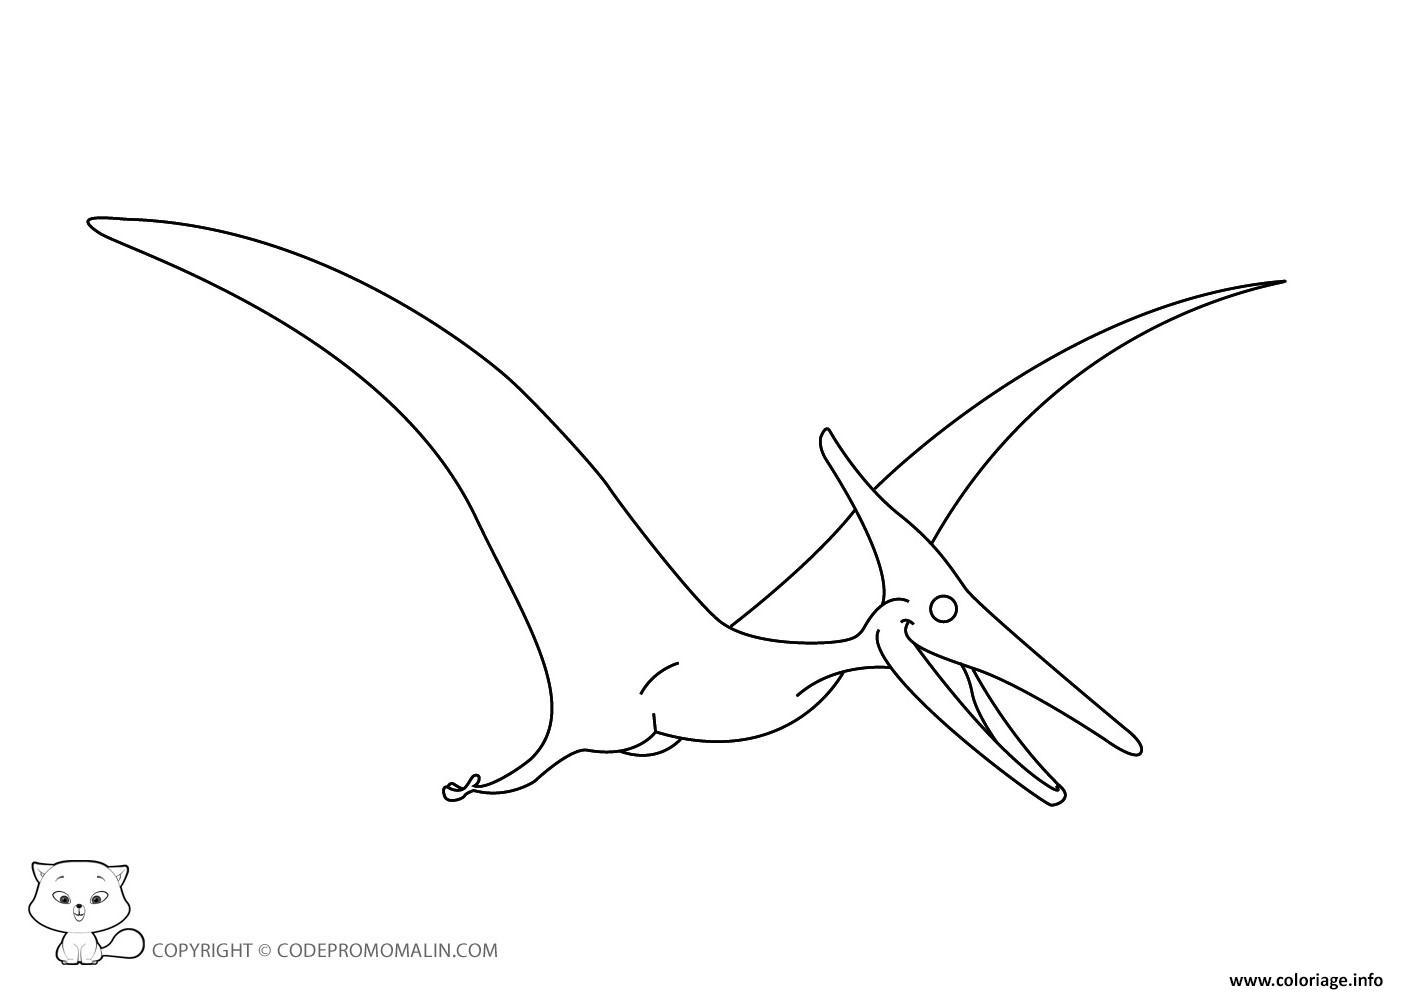 Coloriage dinosaure 147 dessin - Dessin de dinosaure a imprimer ...